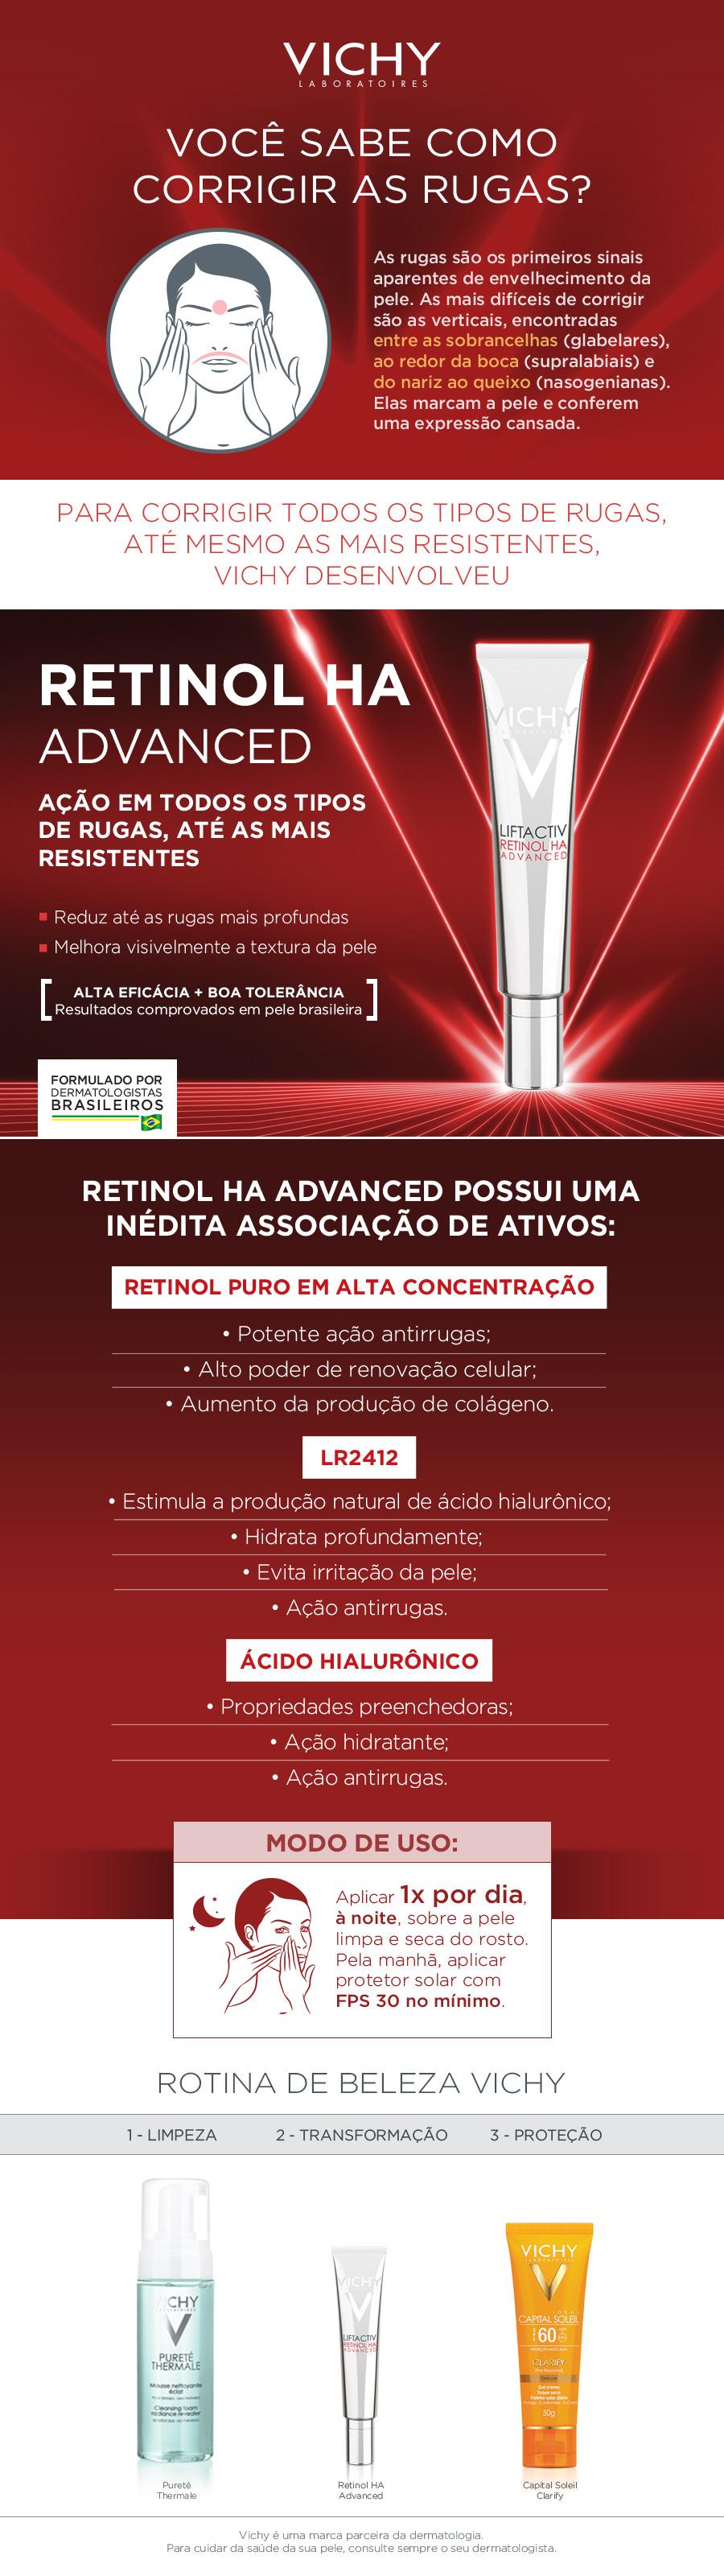 retinol ha